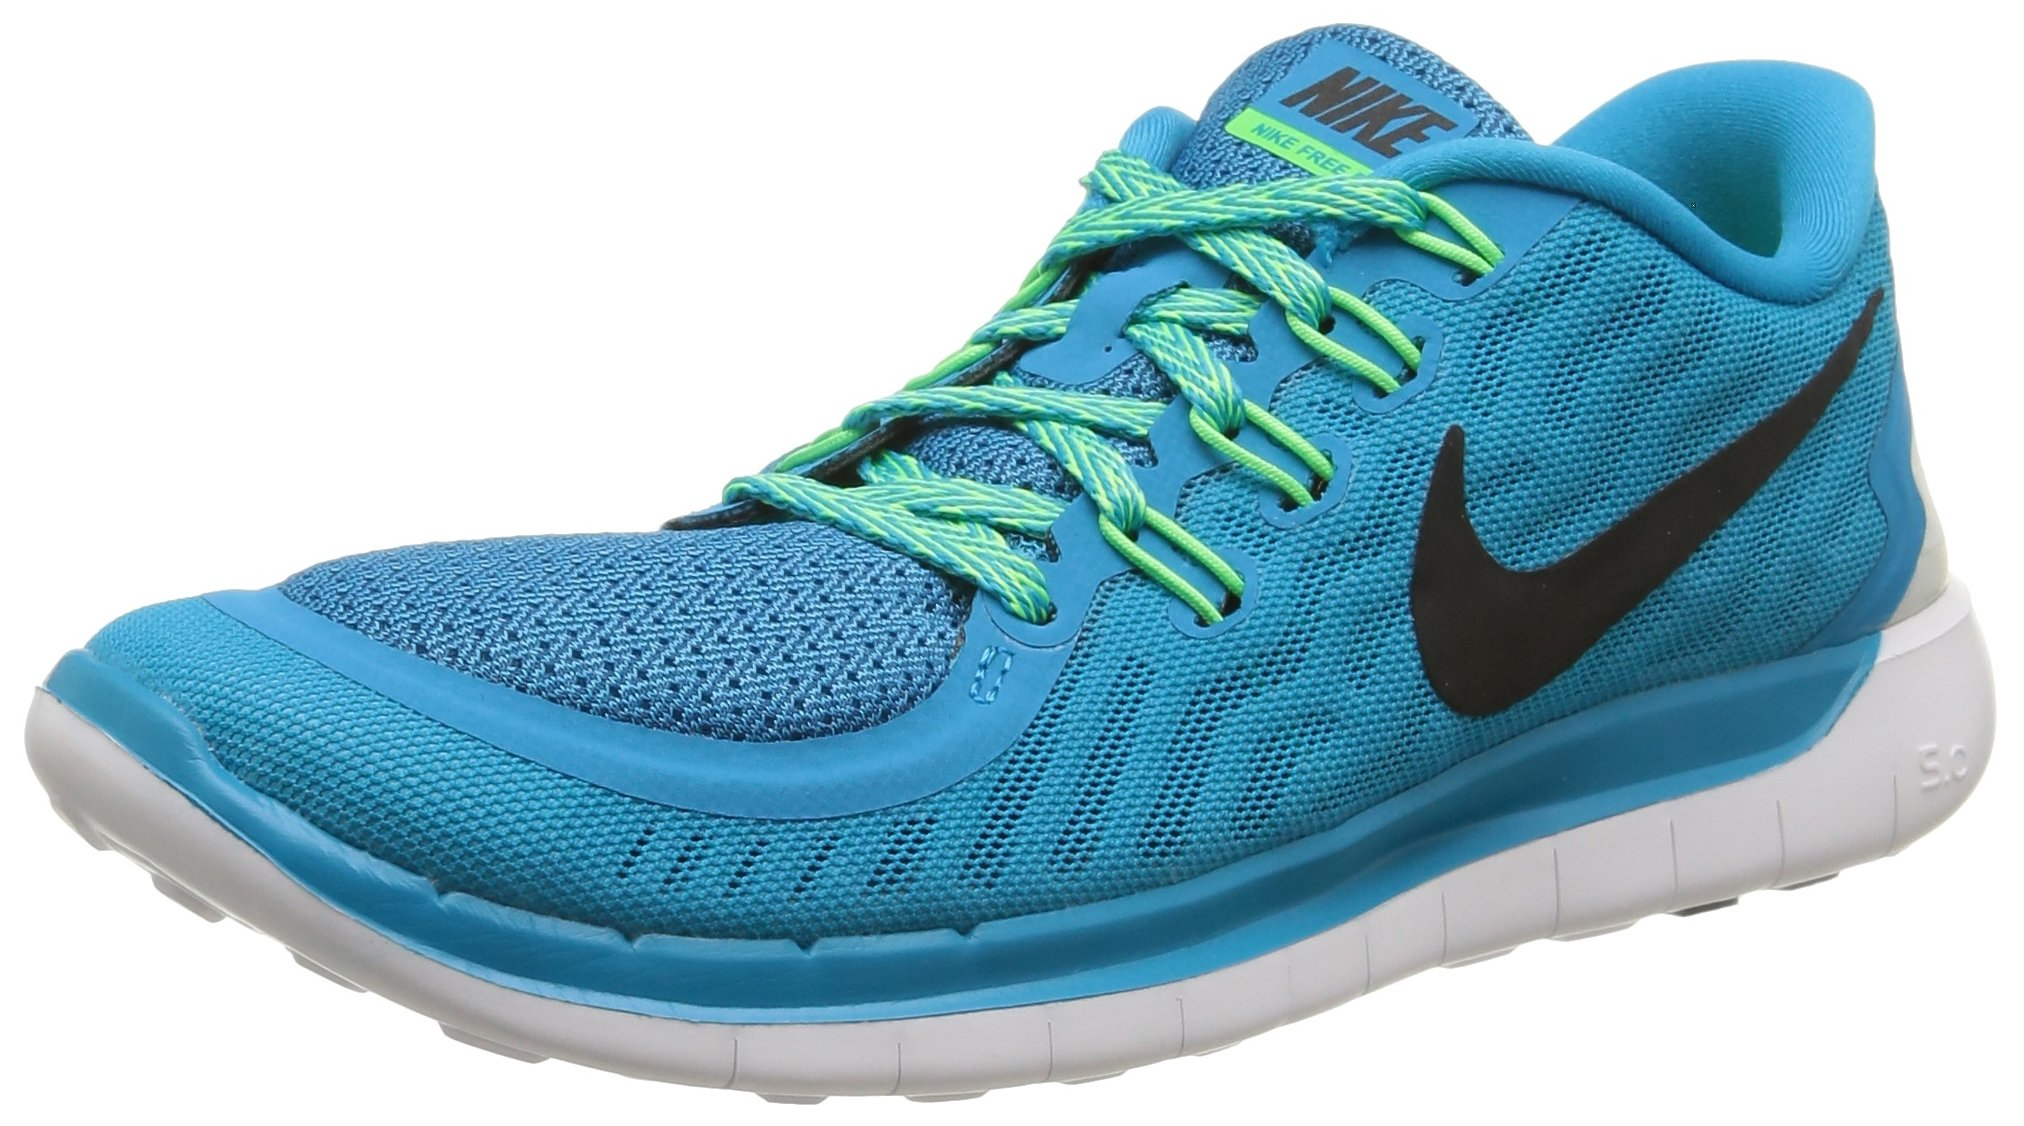 8e6179205361 Galleon - Nike Women s Free 5.0 Running Shoes (6 B(M) US